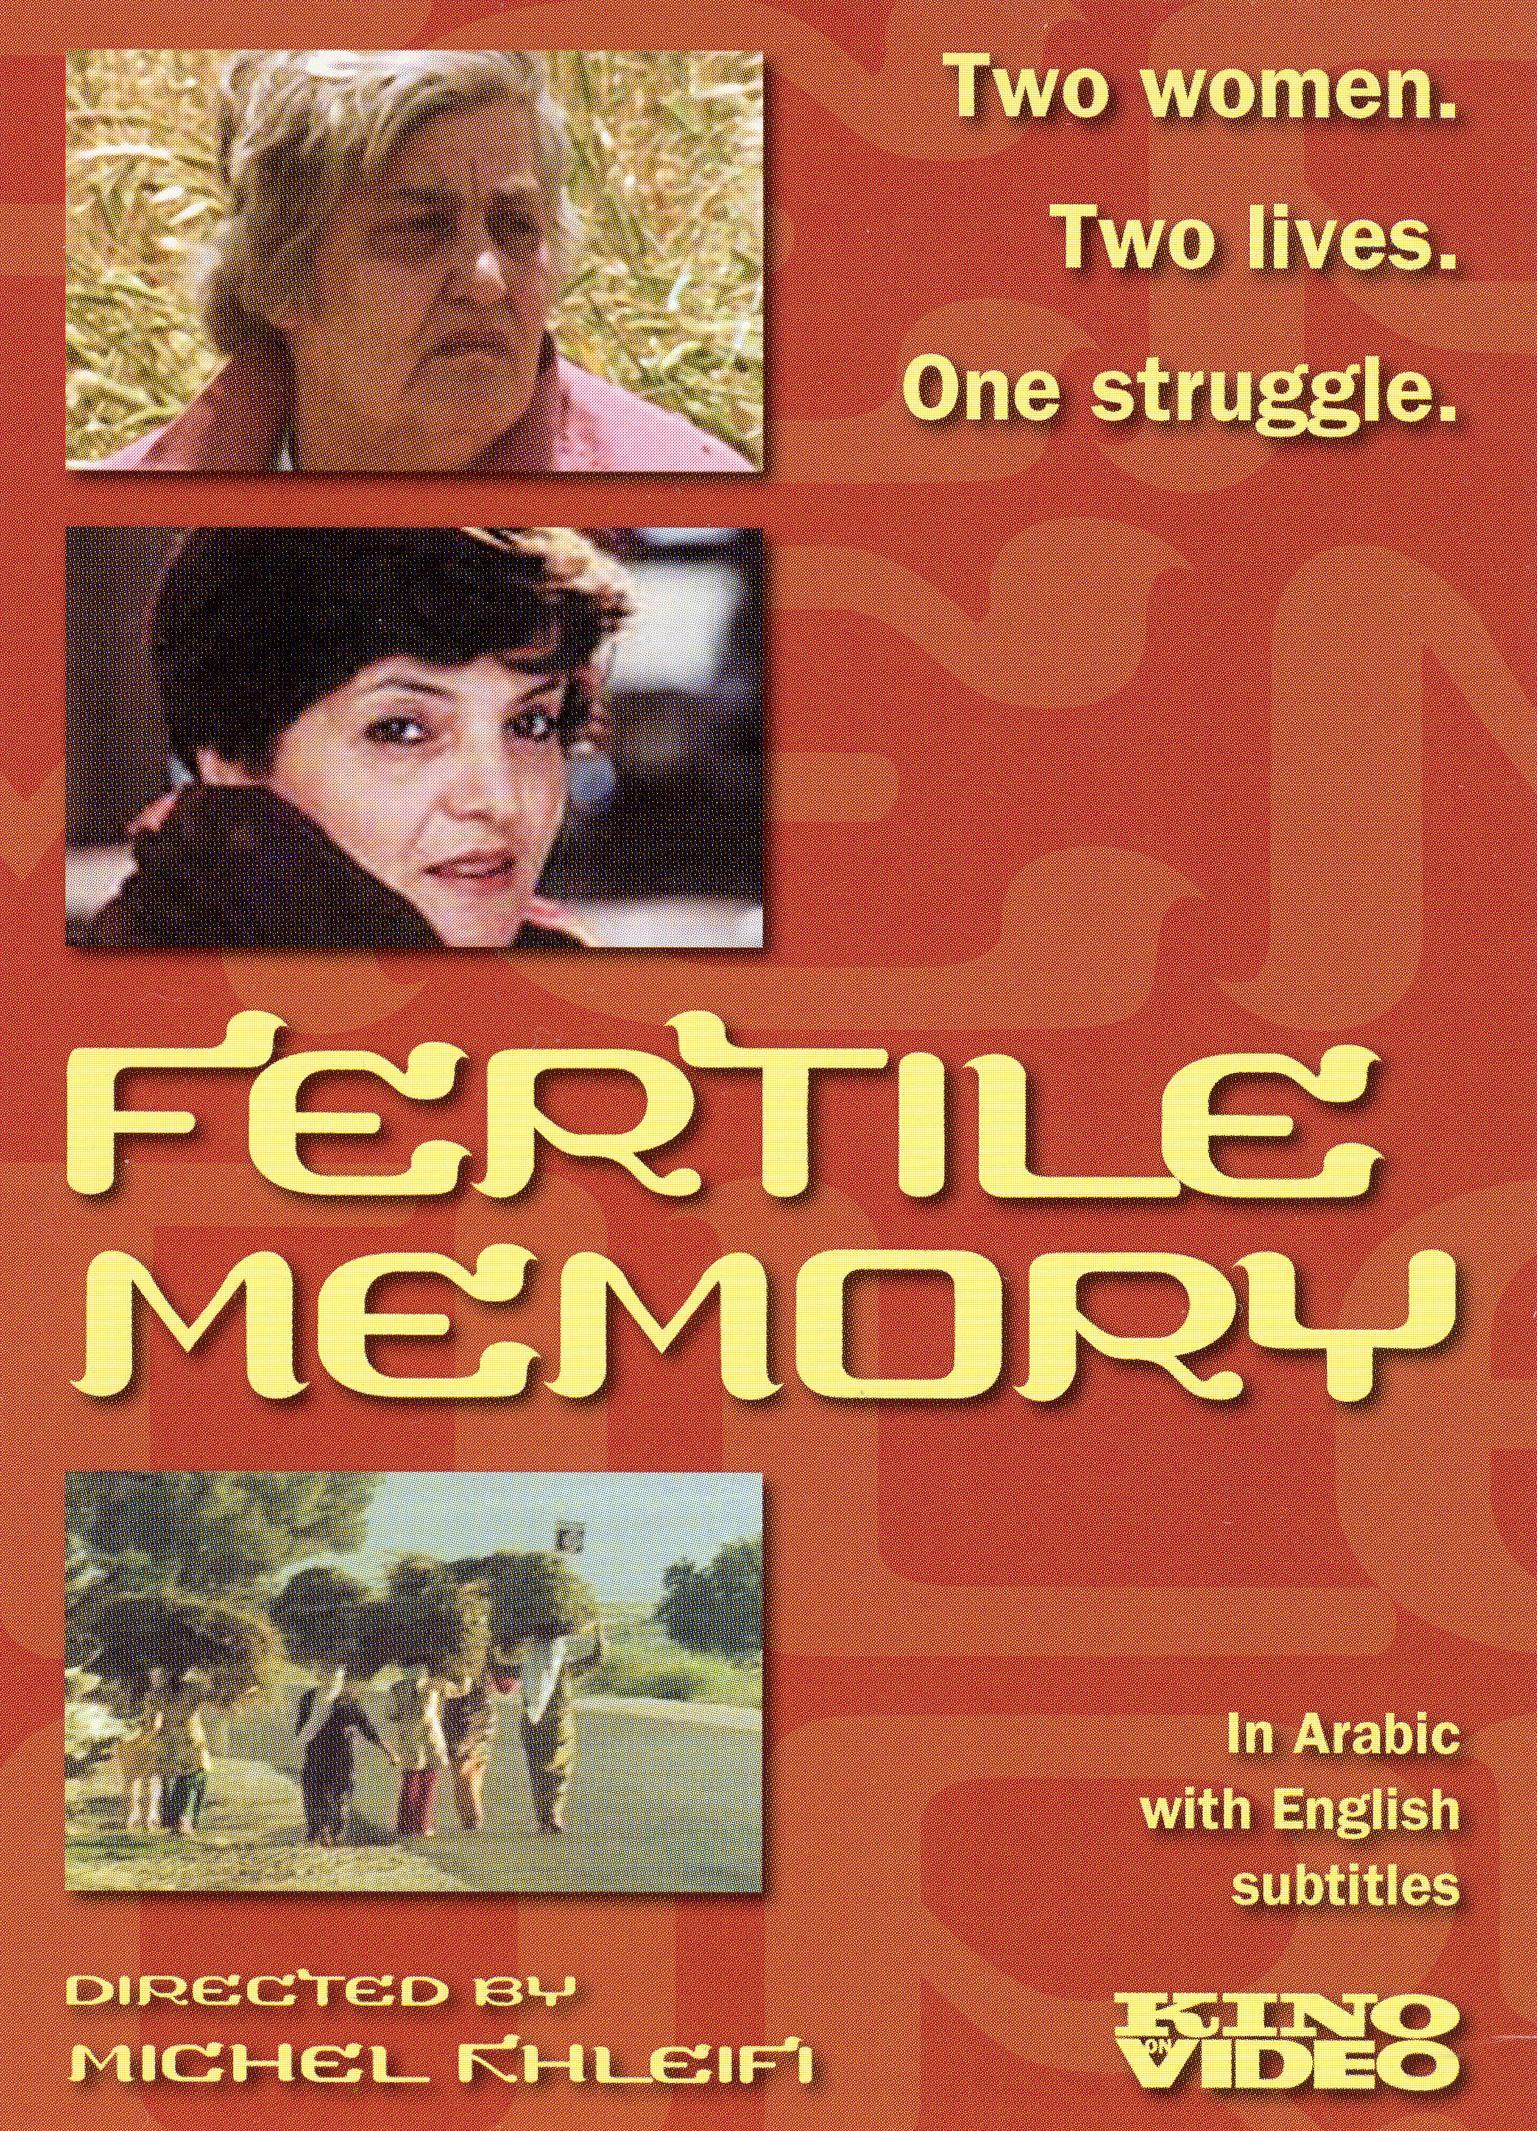 The Fertile Memory